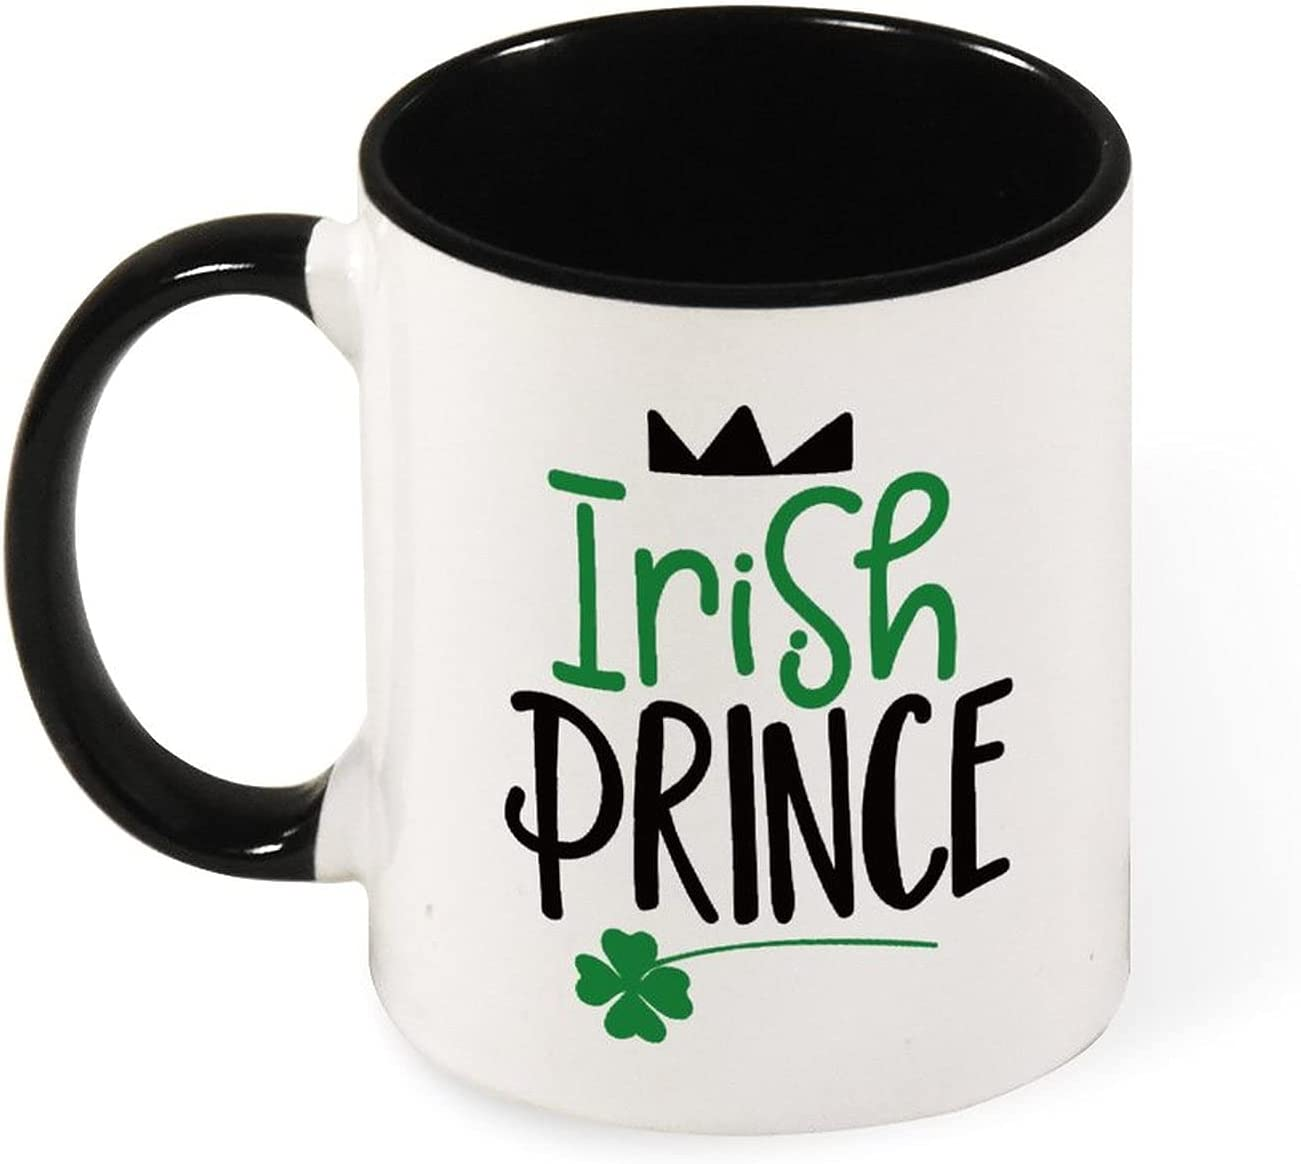 Ceramic coffee cup San Antonio Mall for cappuccino latte PRINCE or tea hot Al sold out. IRISH